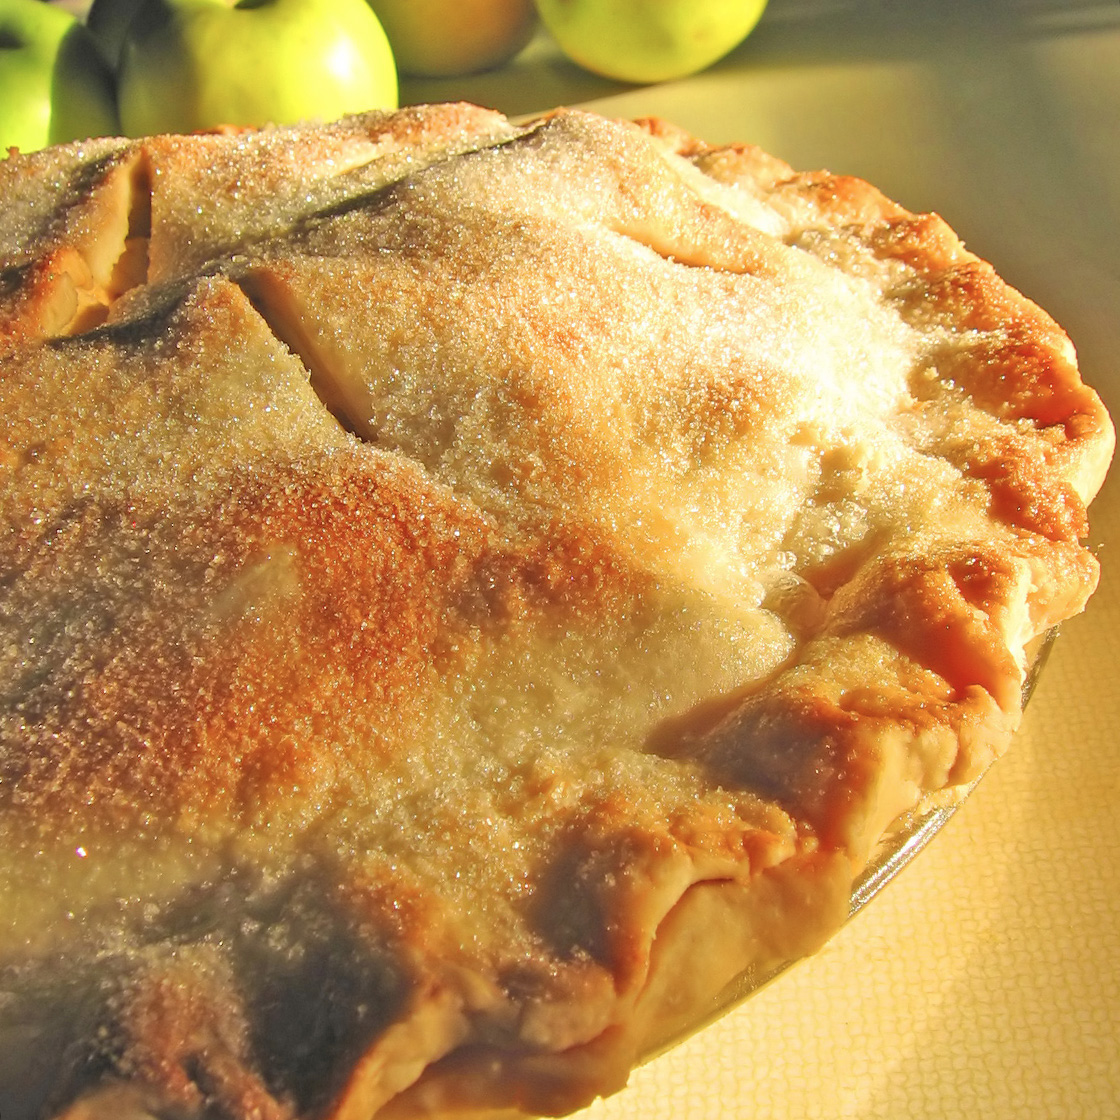 Apple pie di Helen